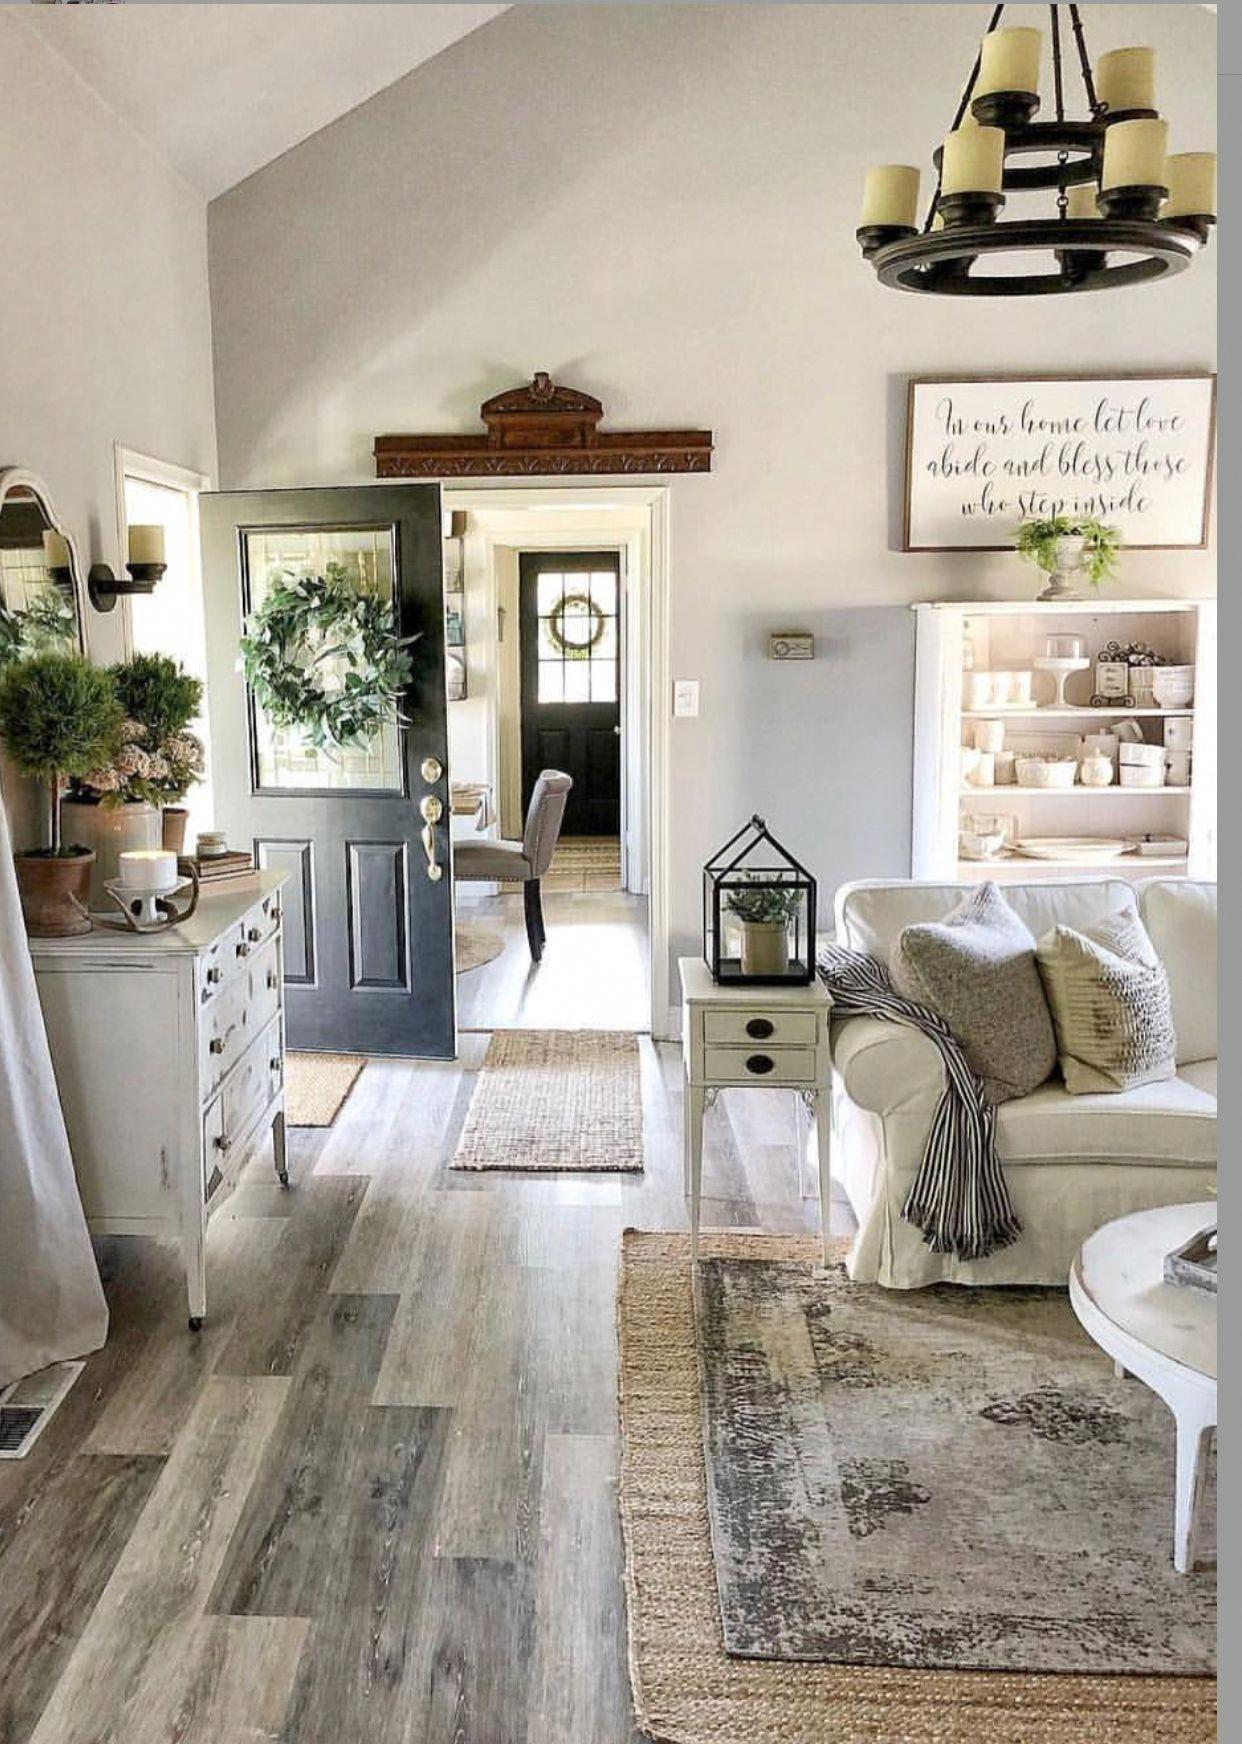 Cheap Home Decor Kitchen SalePrice44 Farmhouse style